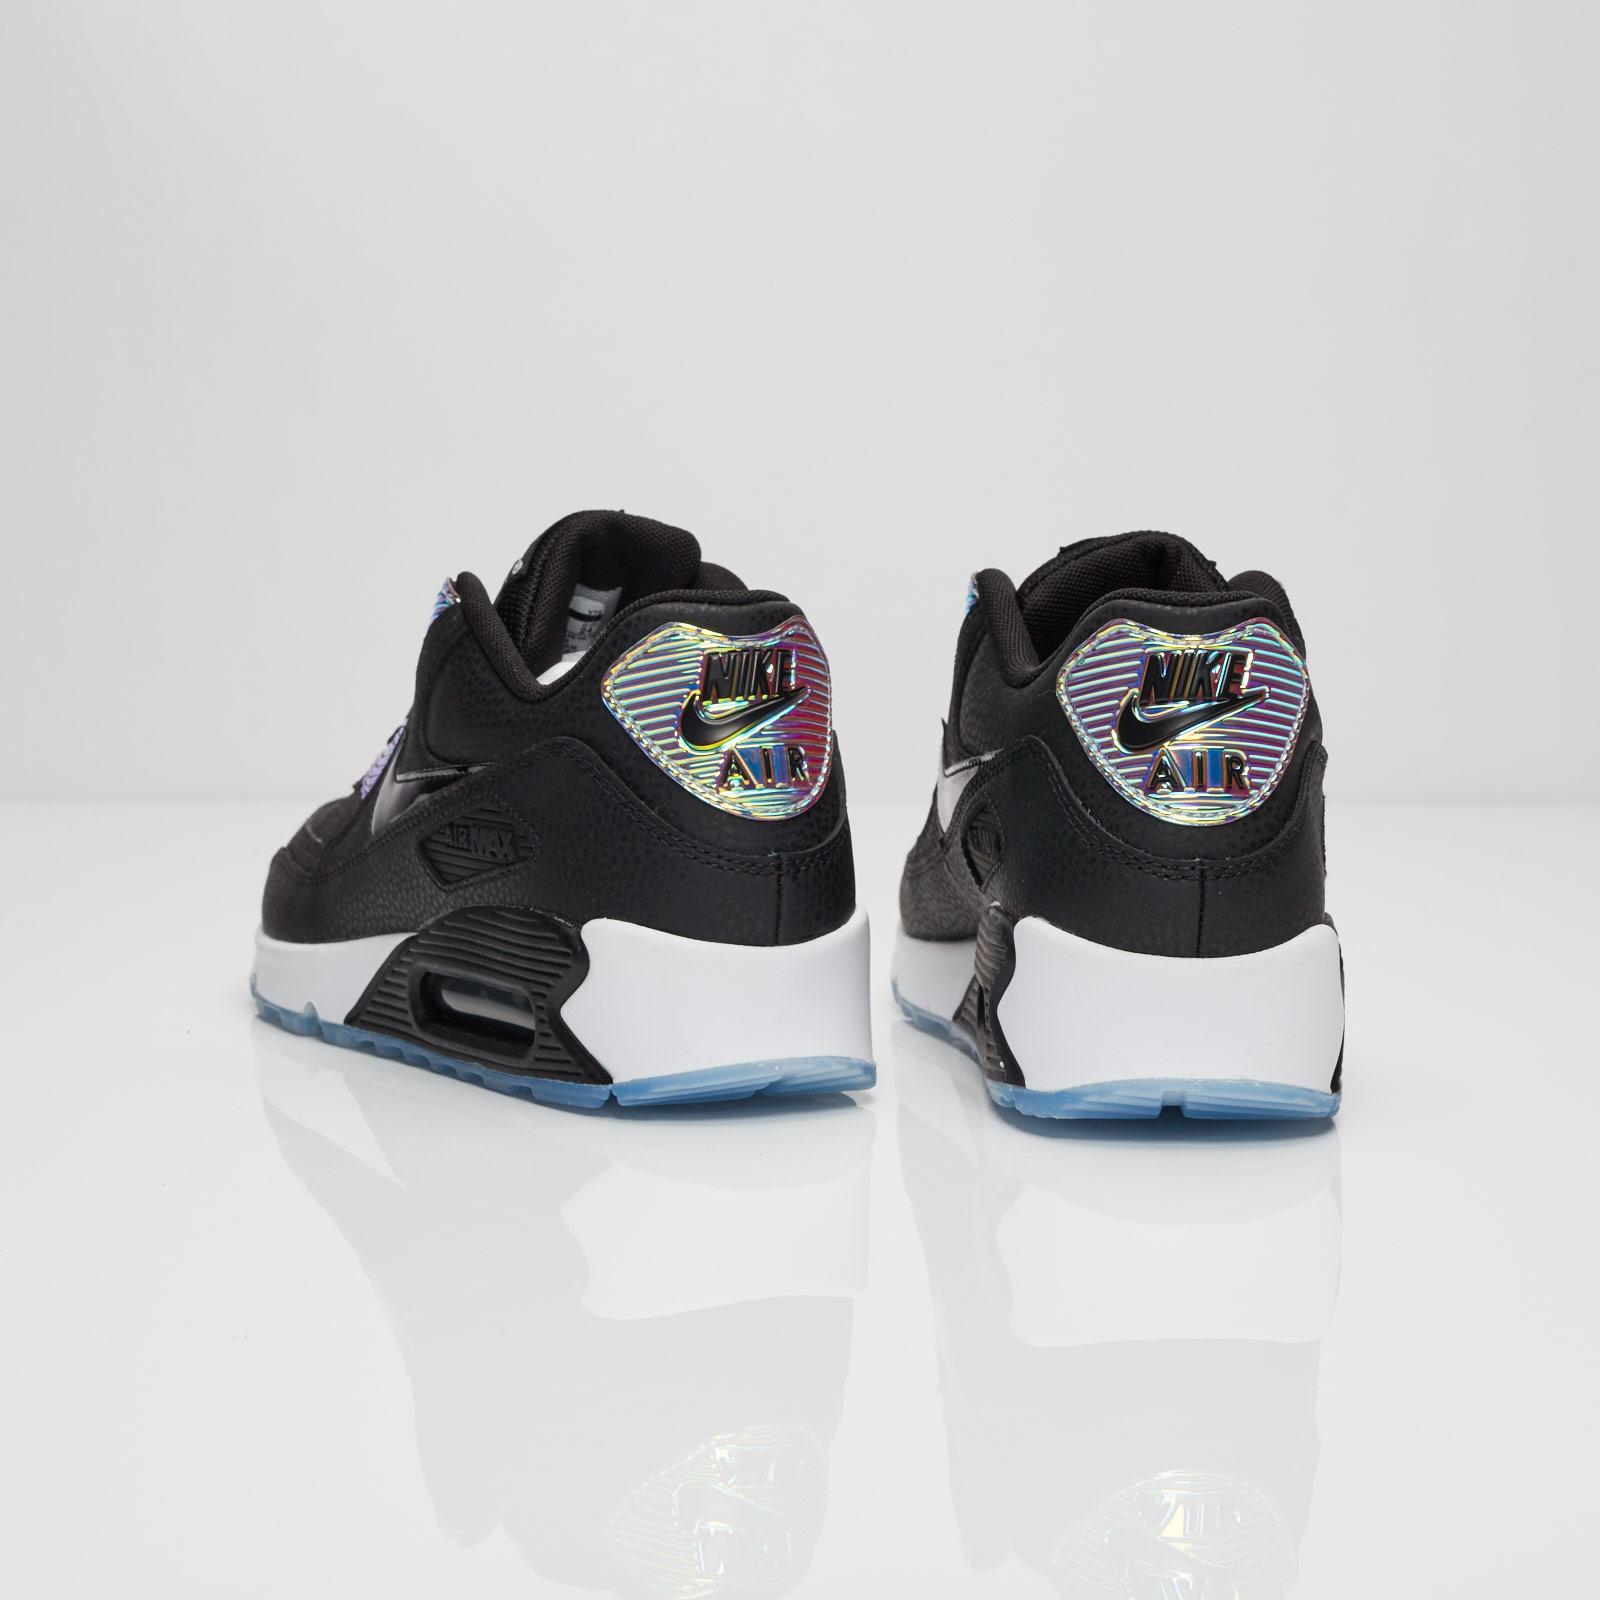 d800423e31a1 Nike Wmns Air Max 90 Premium - 443817-008 - Sneakersnstuff ...